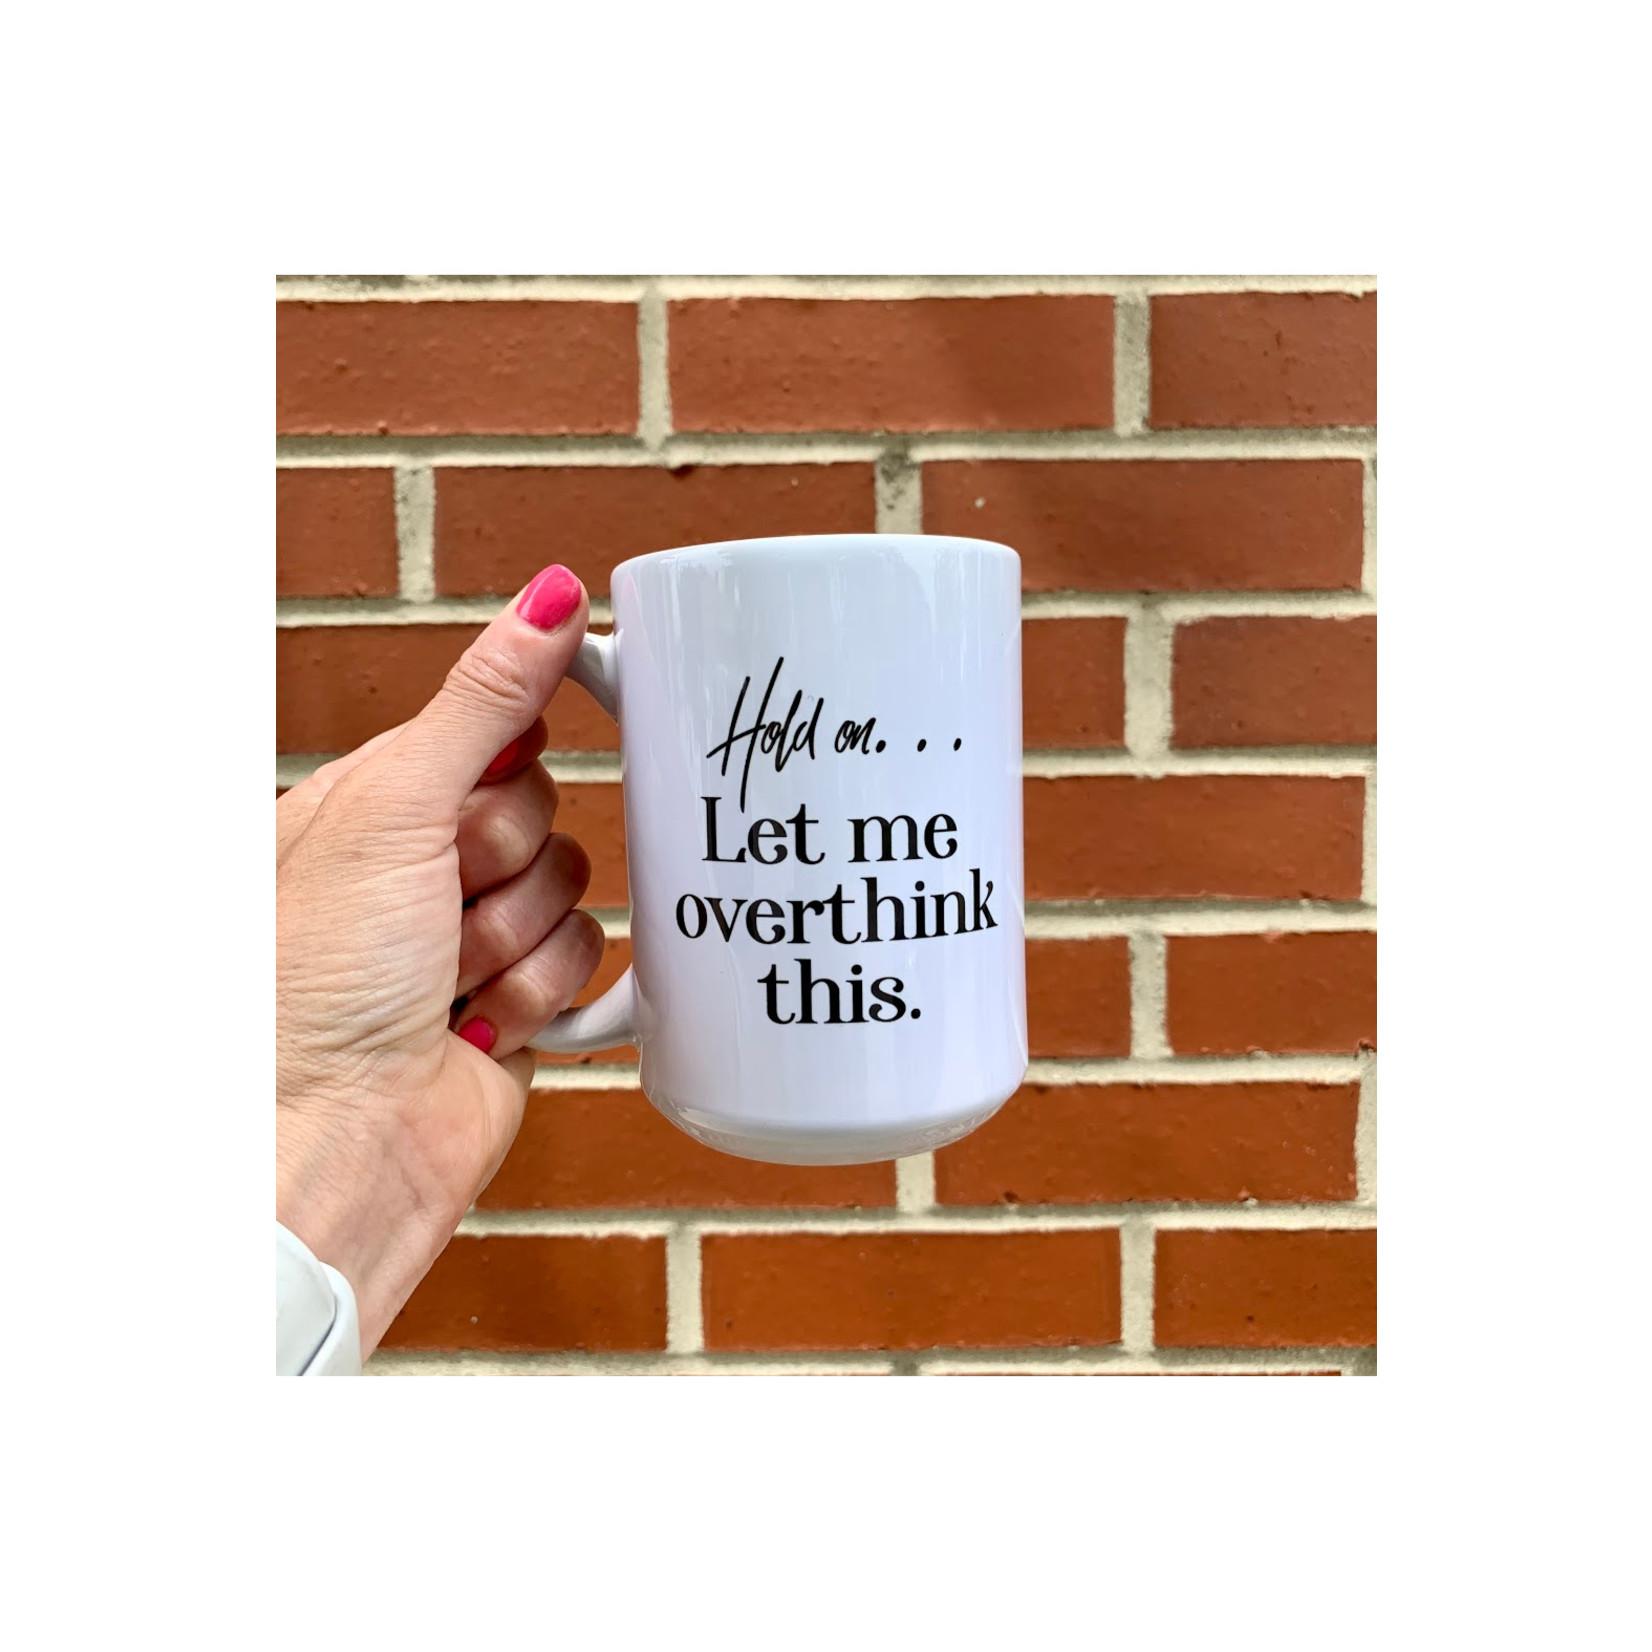 Send Me a Dream Overthink This Mug